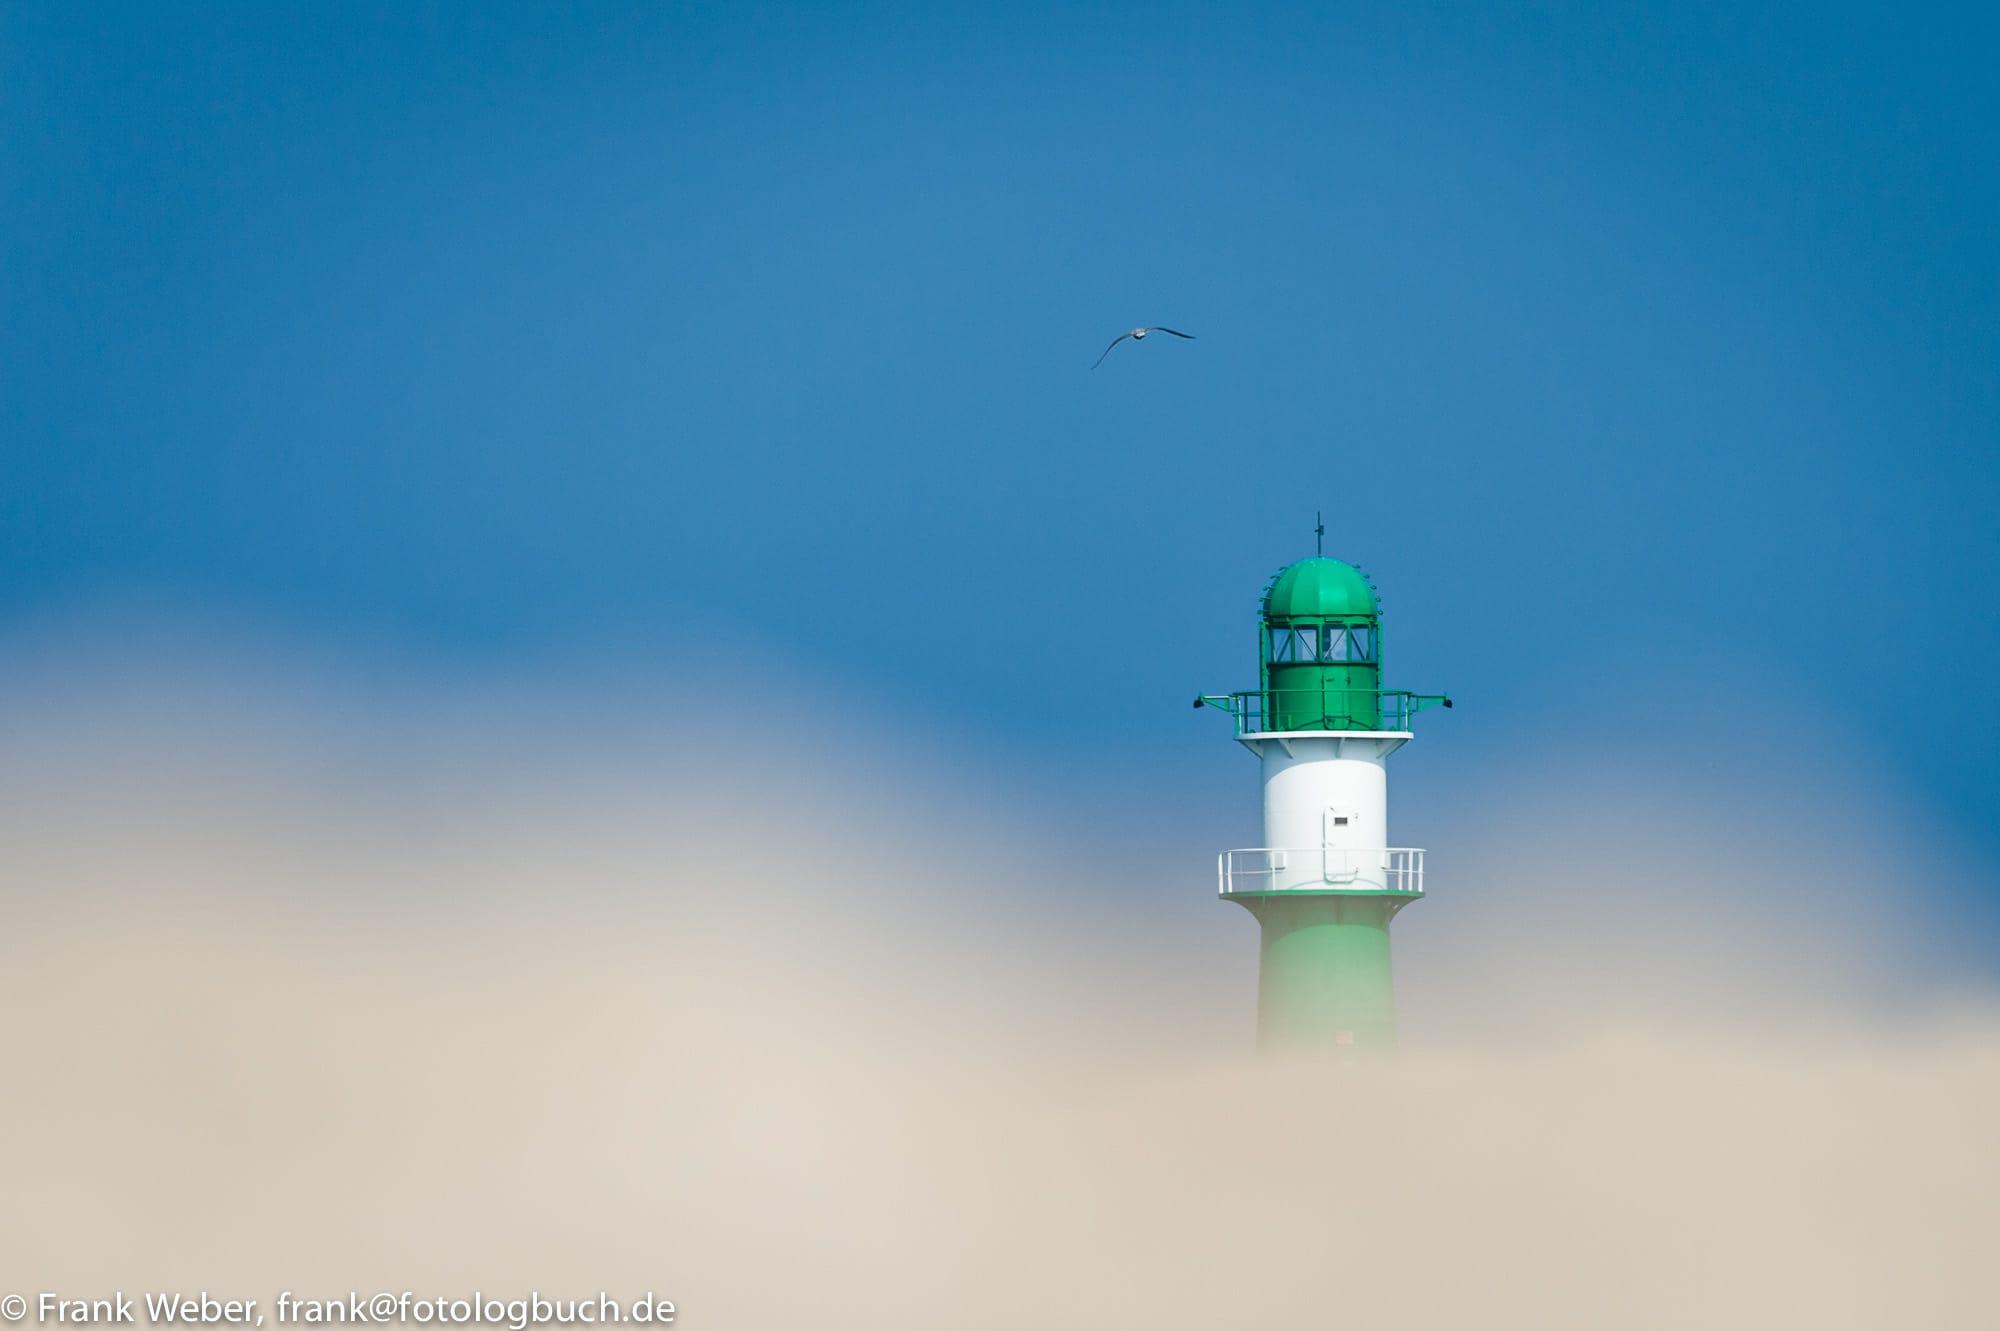 Leuchtturm Warnemünde im Sandsturm, (Foto copyright - Frank Weber - Berlin - fotologbuch.de)